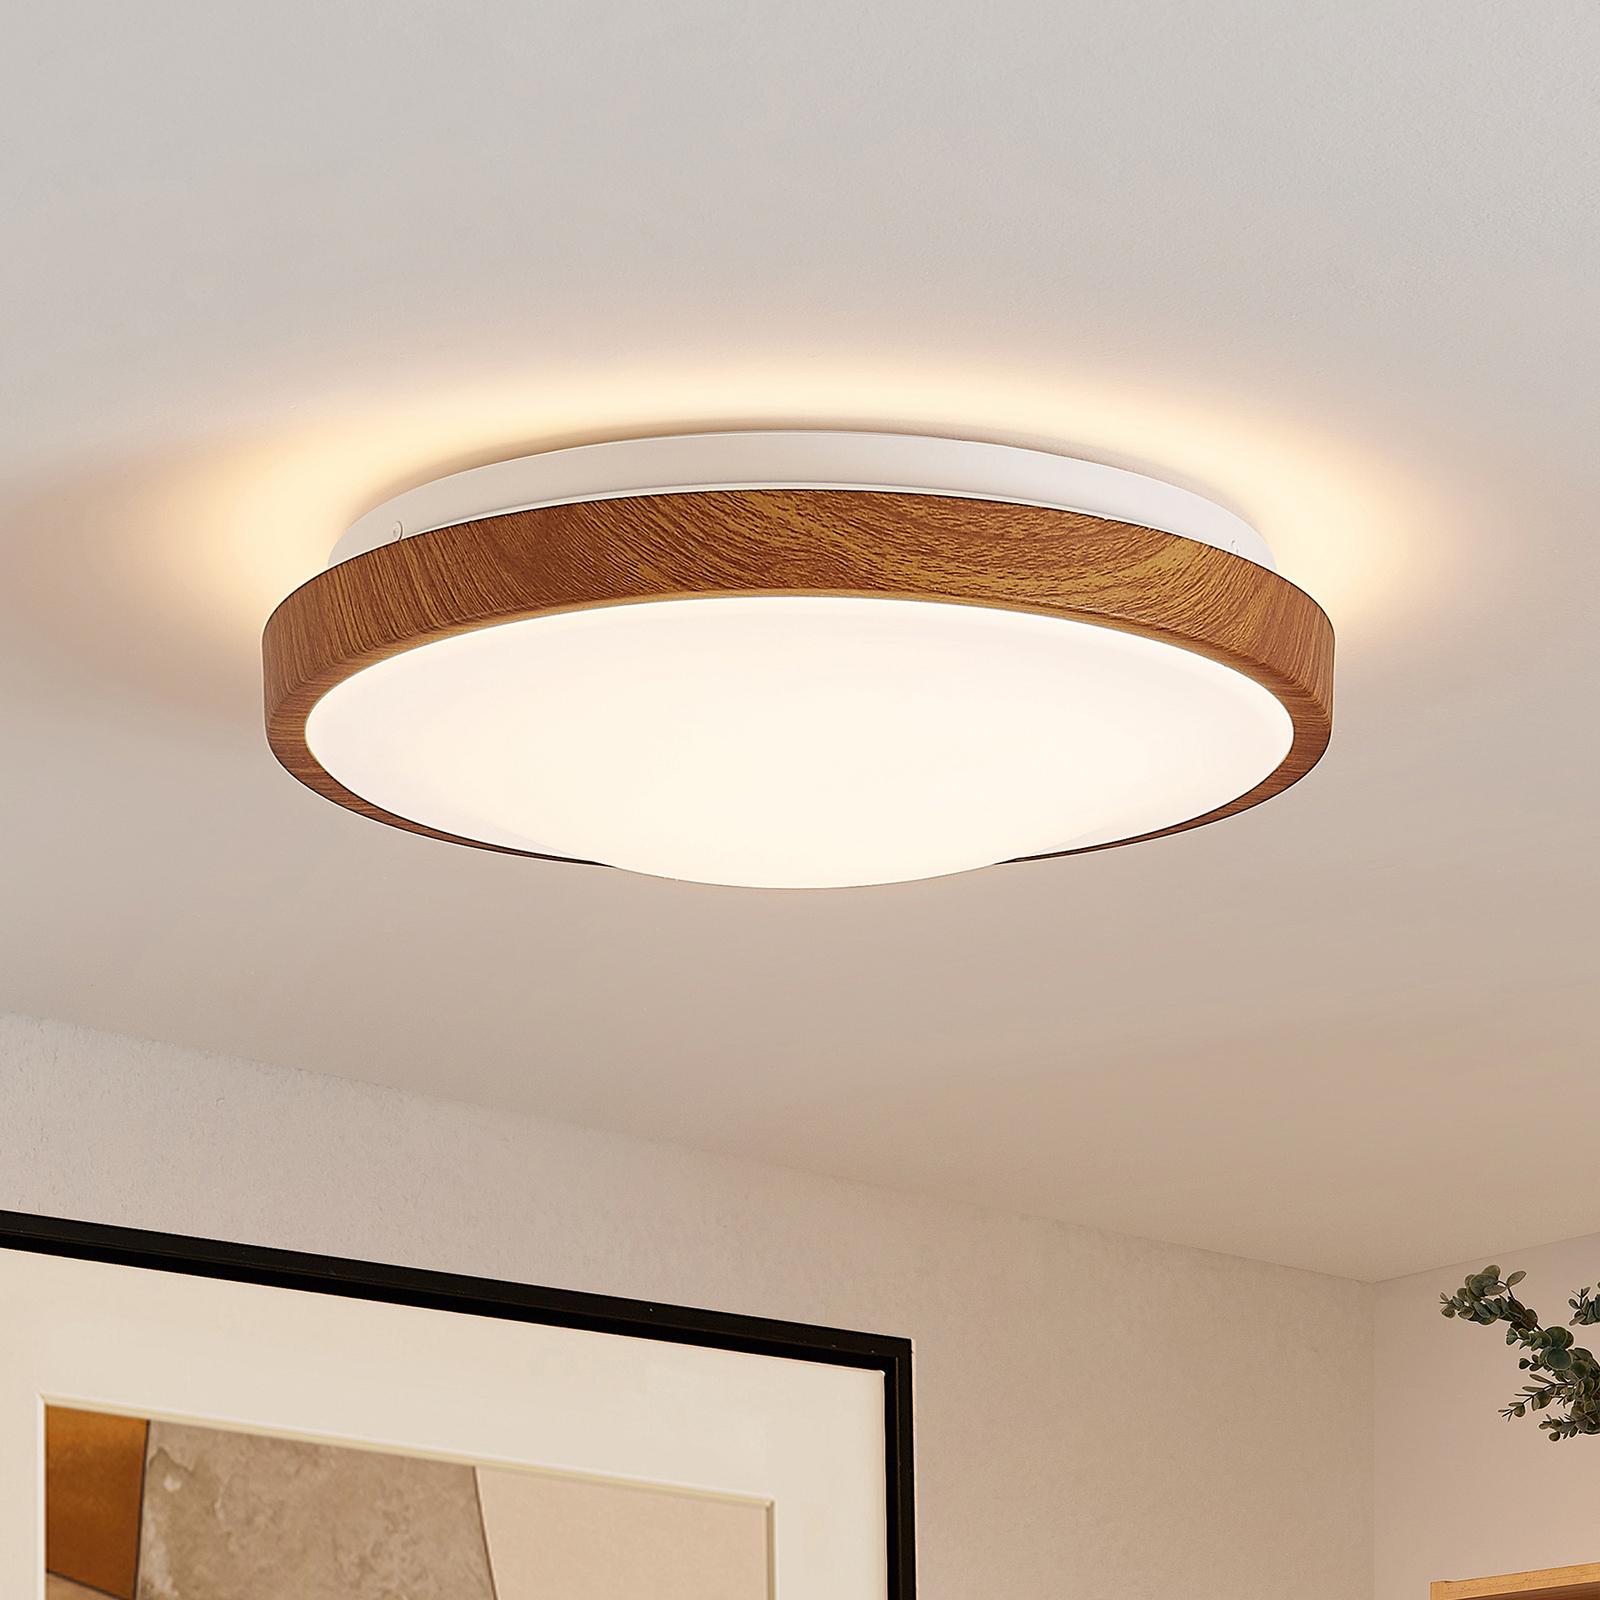 Lindby Mynte LED-loftlampe, rund, 29,5 cm